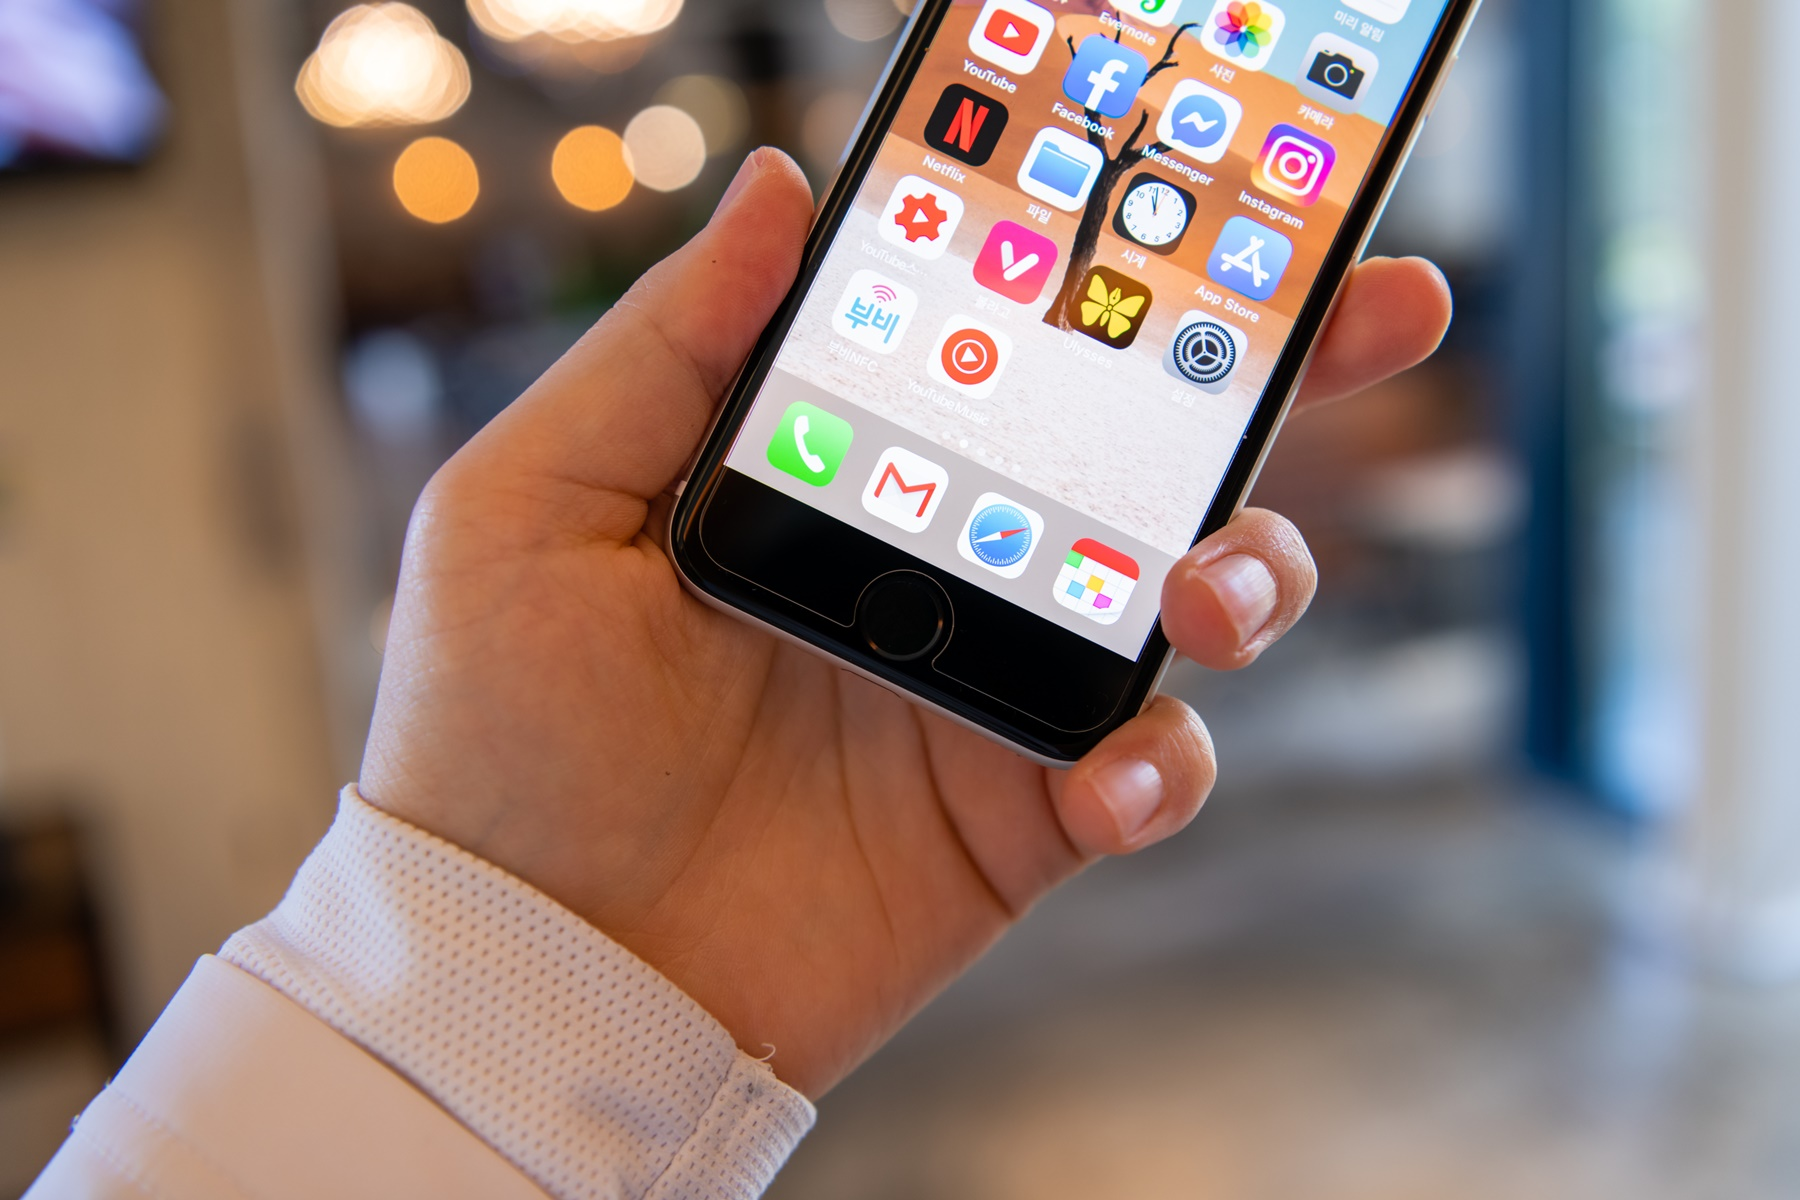 아이폰SE2, 아이폰SE, 아이폰리뷰, iphone